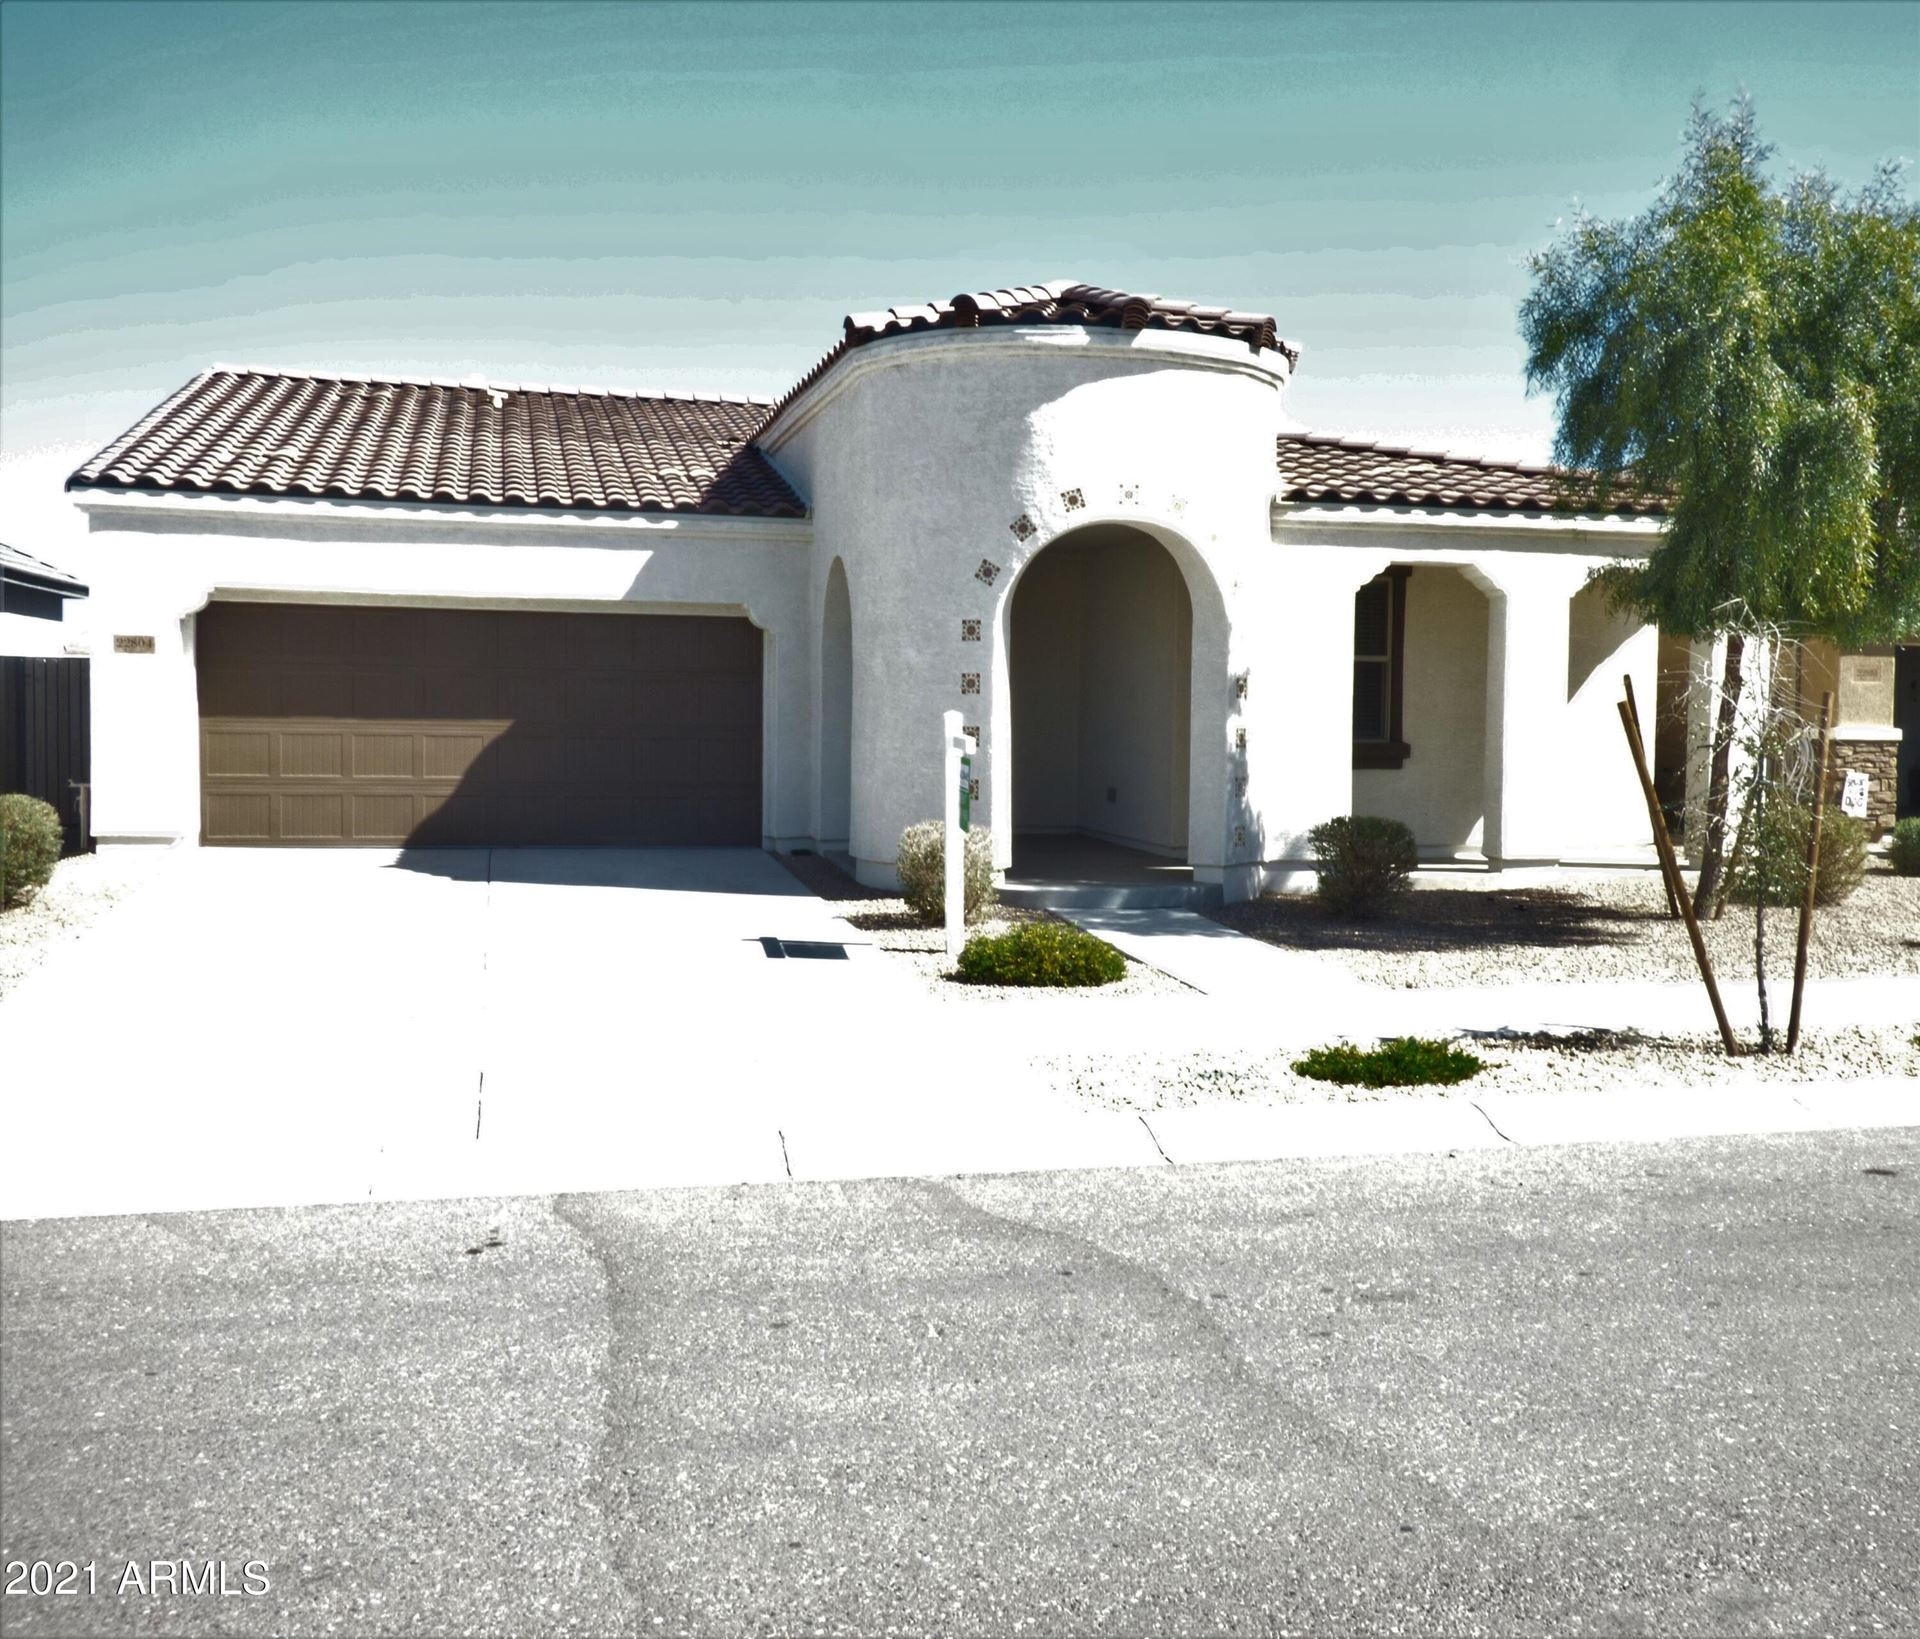 Photo of 22804 E VIA DE OLIVOS --, Queen Creek, AZ 85142 (MLS # 6203196)